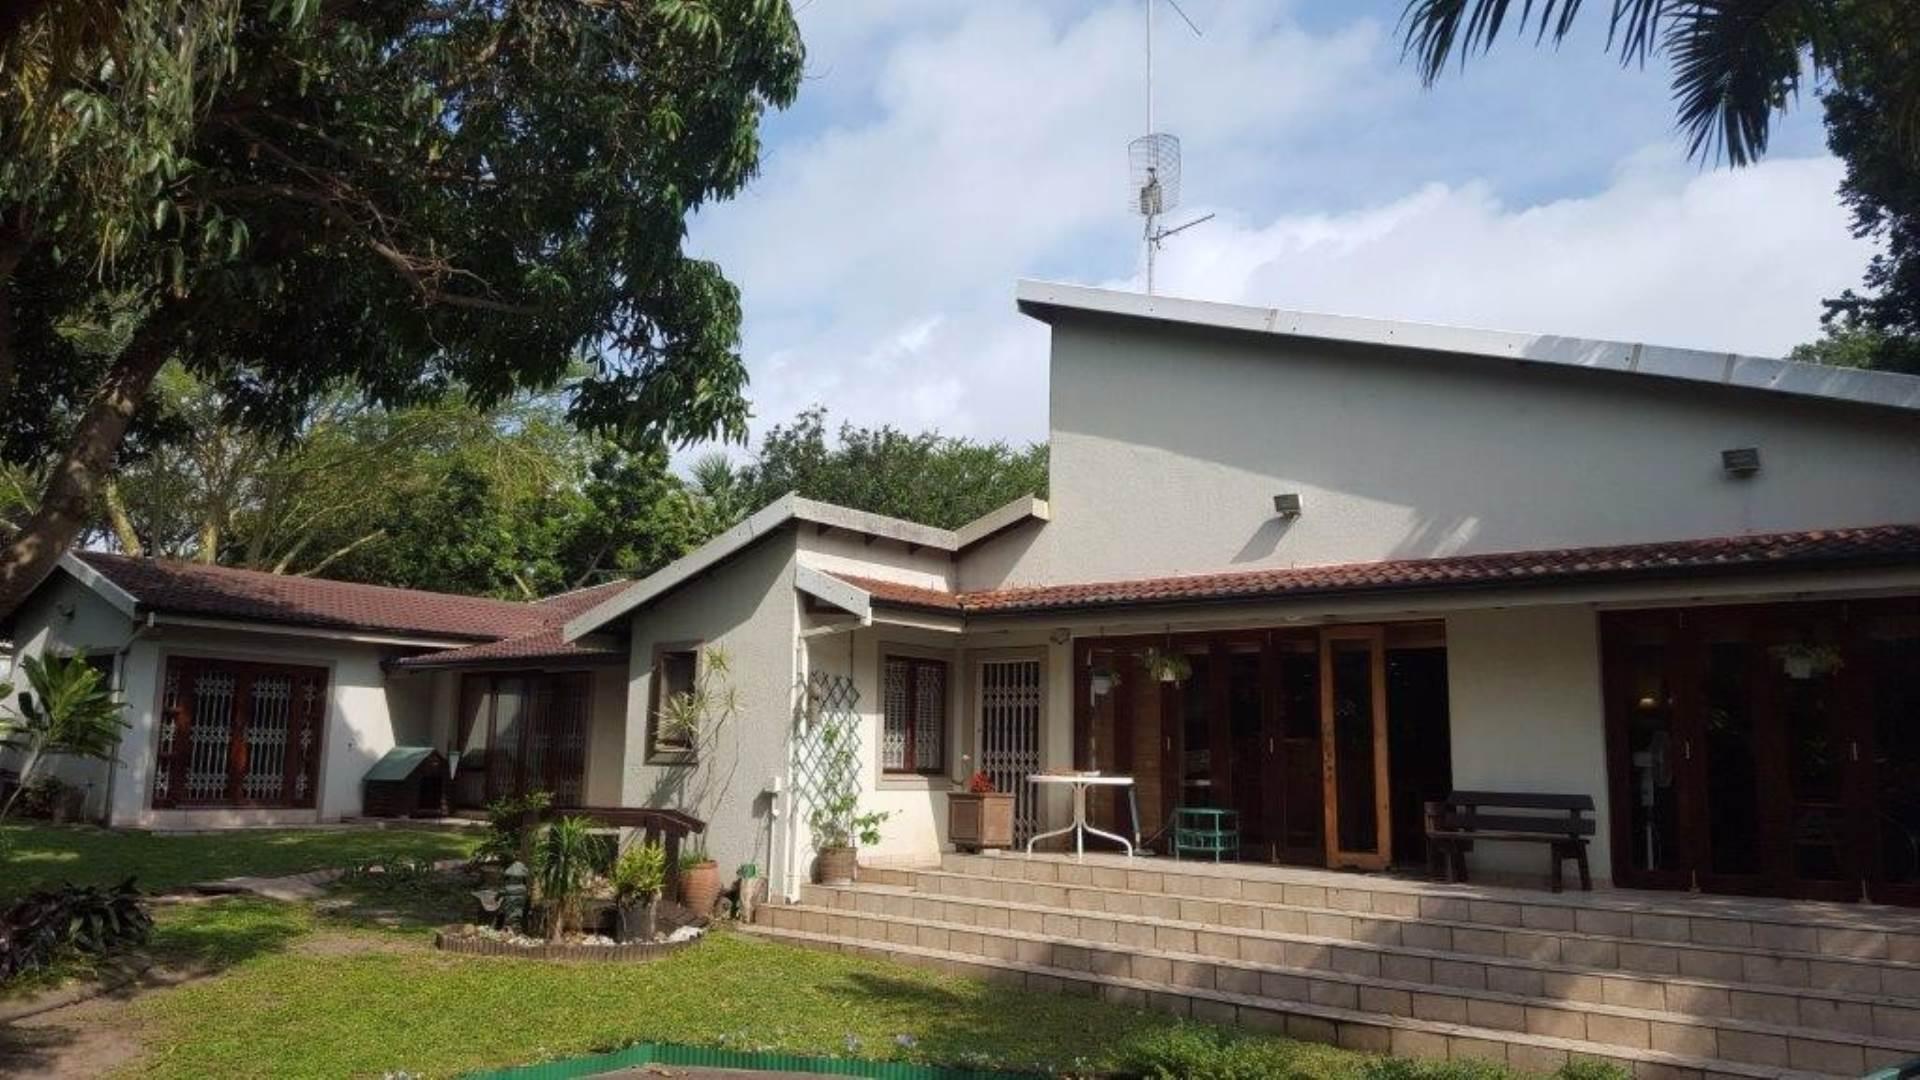 4 BedroomHouse For Sale In Meer En See